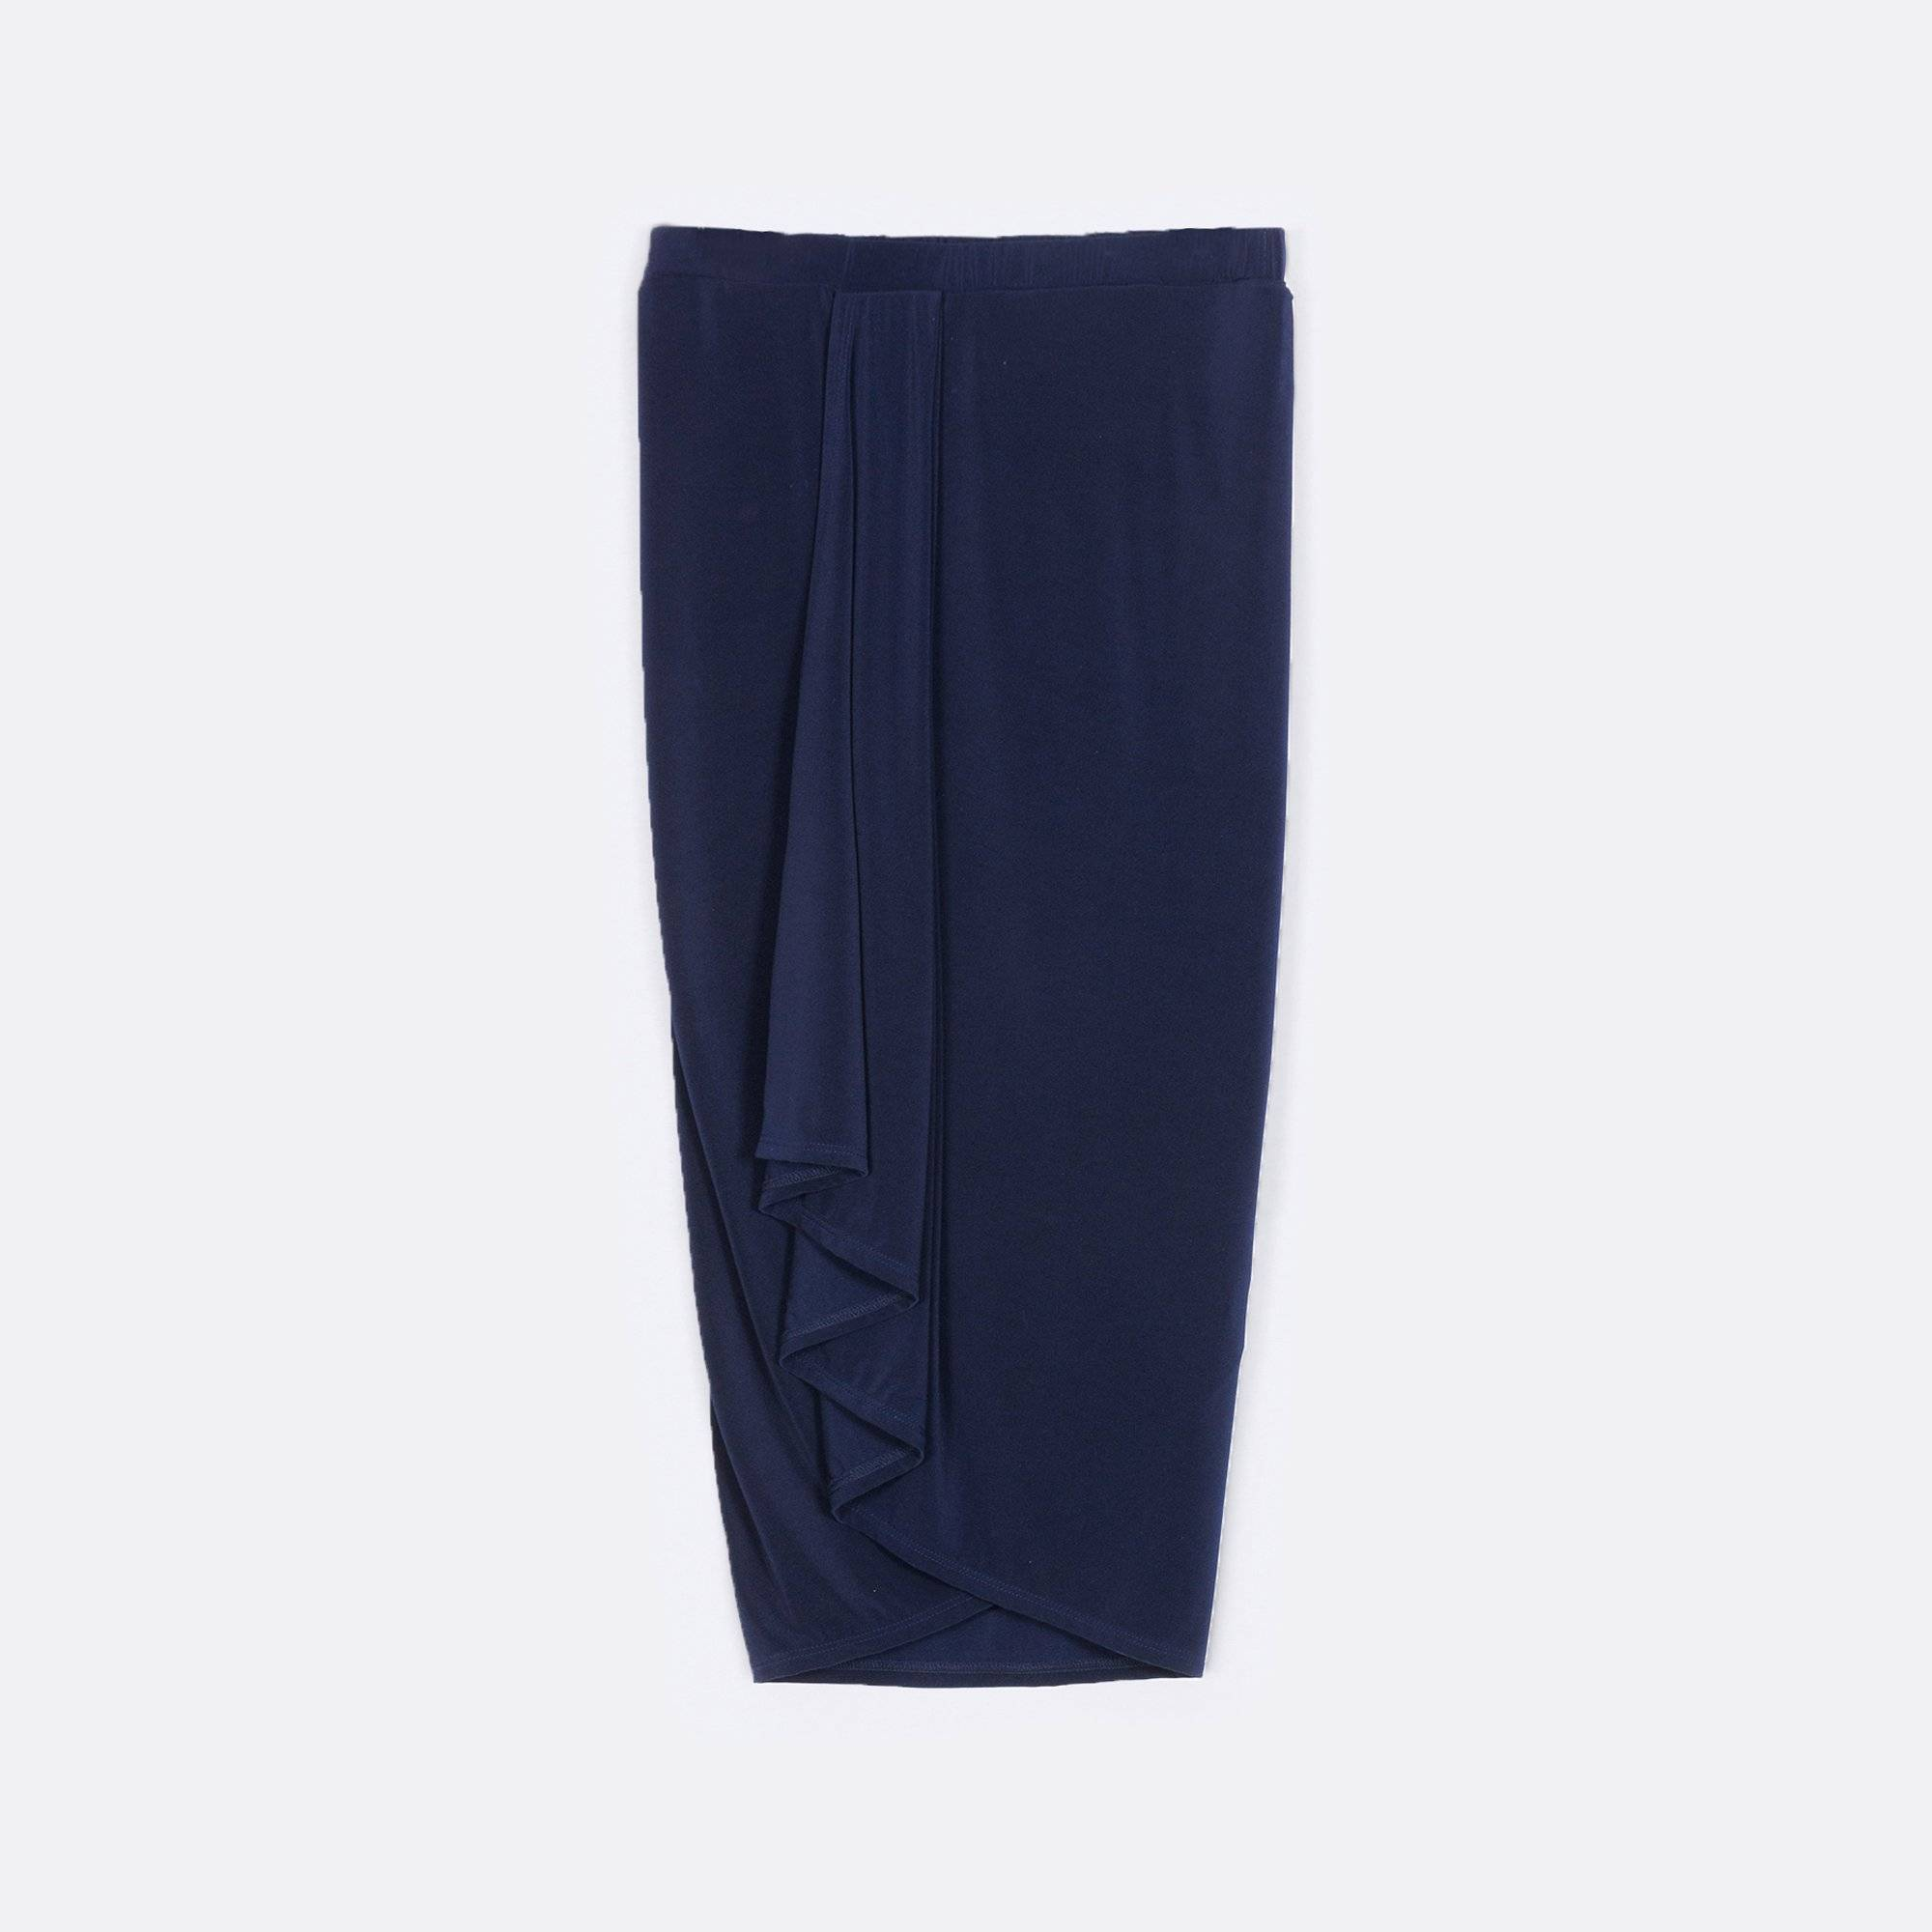 MS. READ Essential Overlap Skirt